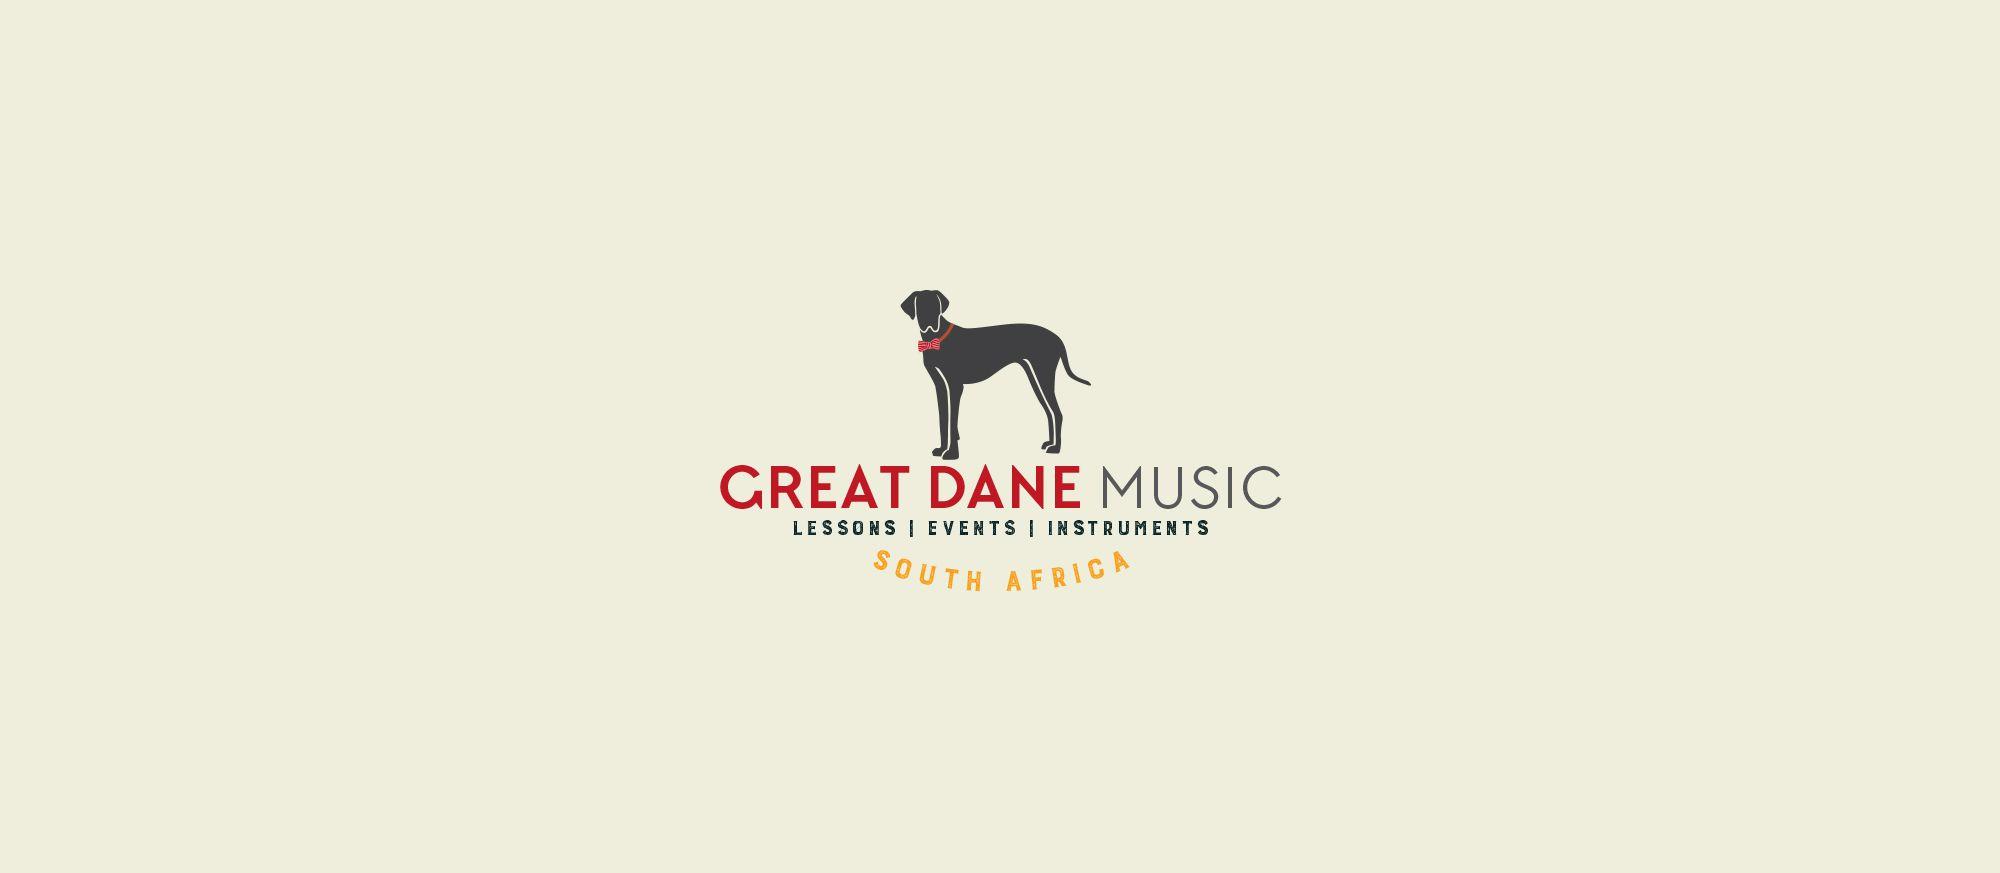 Great Dane Music Sarah Made Design Co Dane Great Dane Make